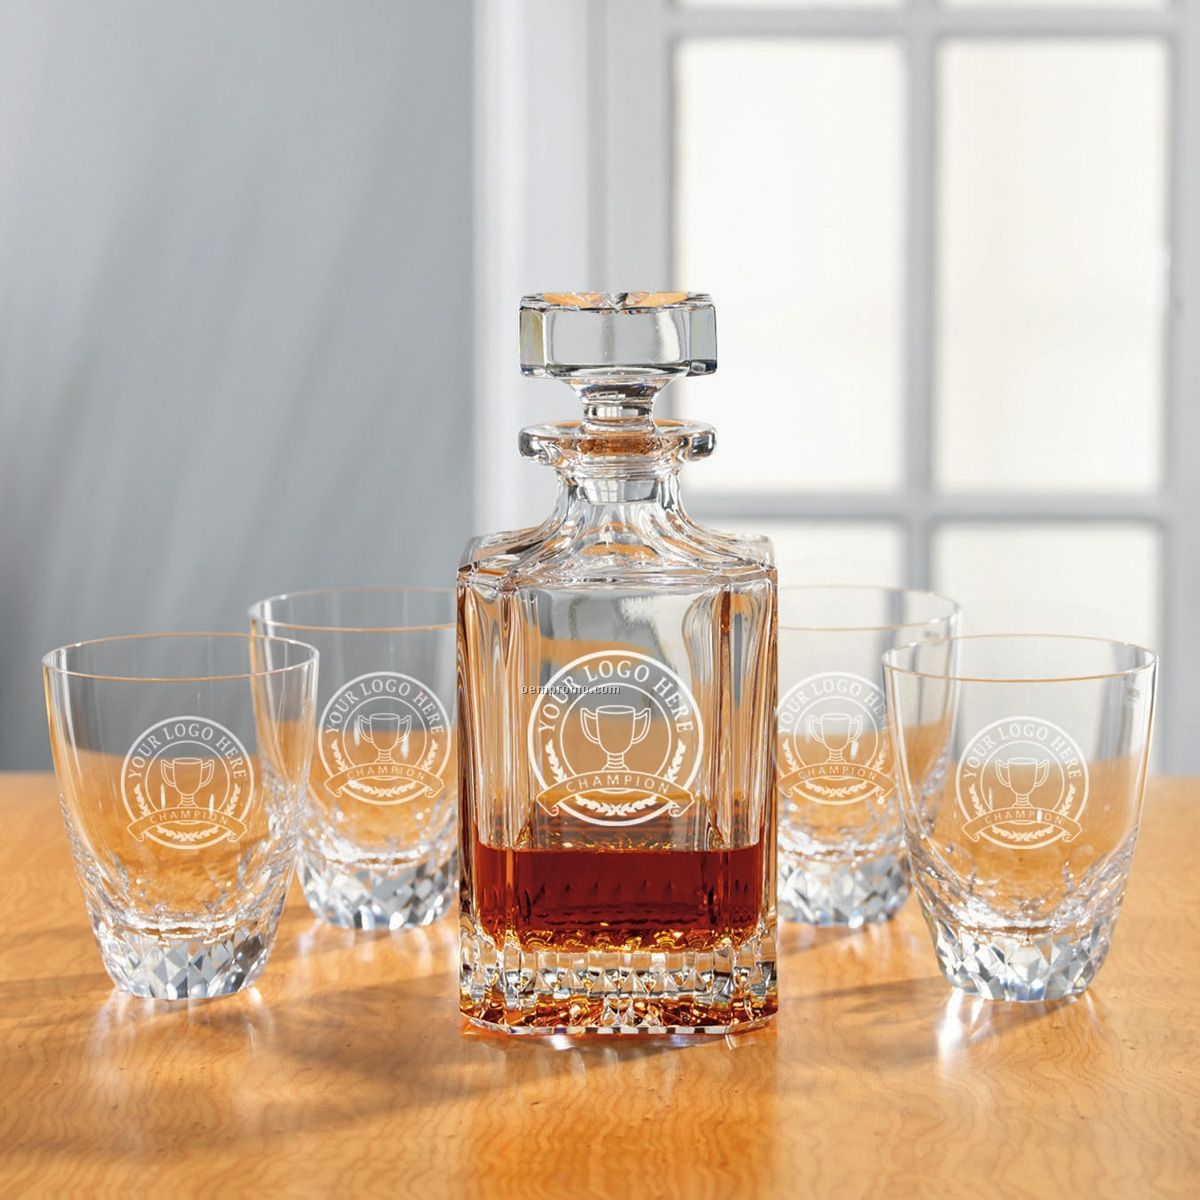 5 Piece Princeton Decanter Set - 1 Decanter & 4 Glasses